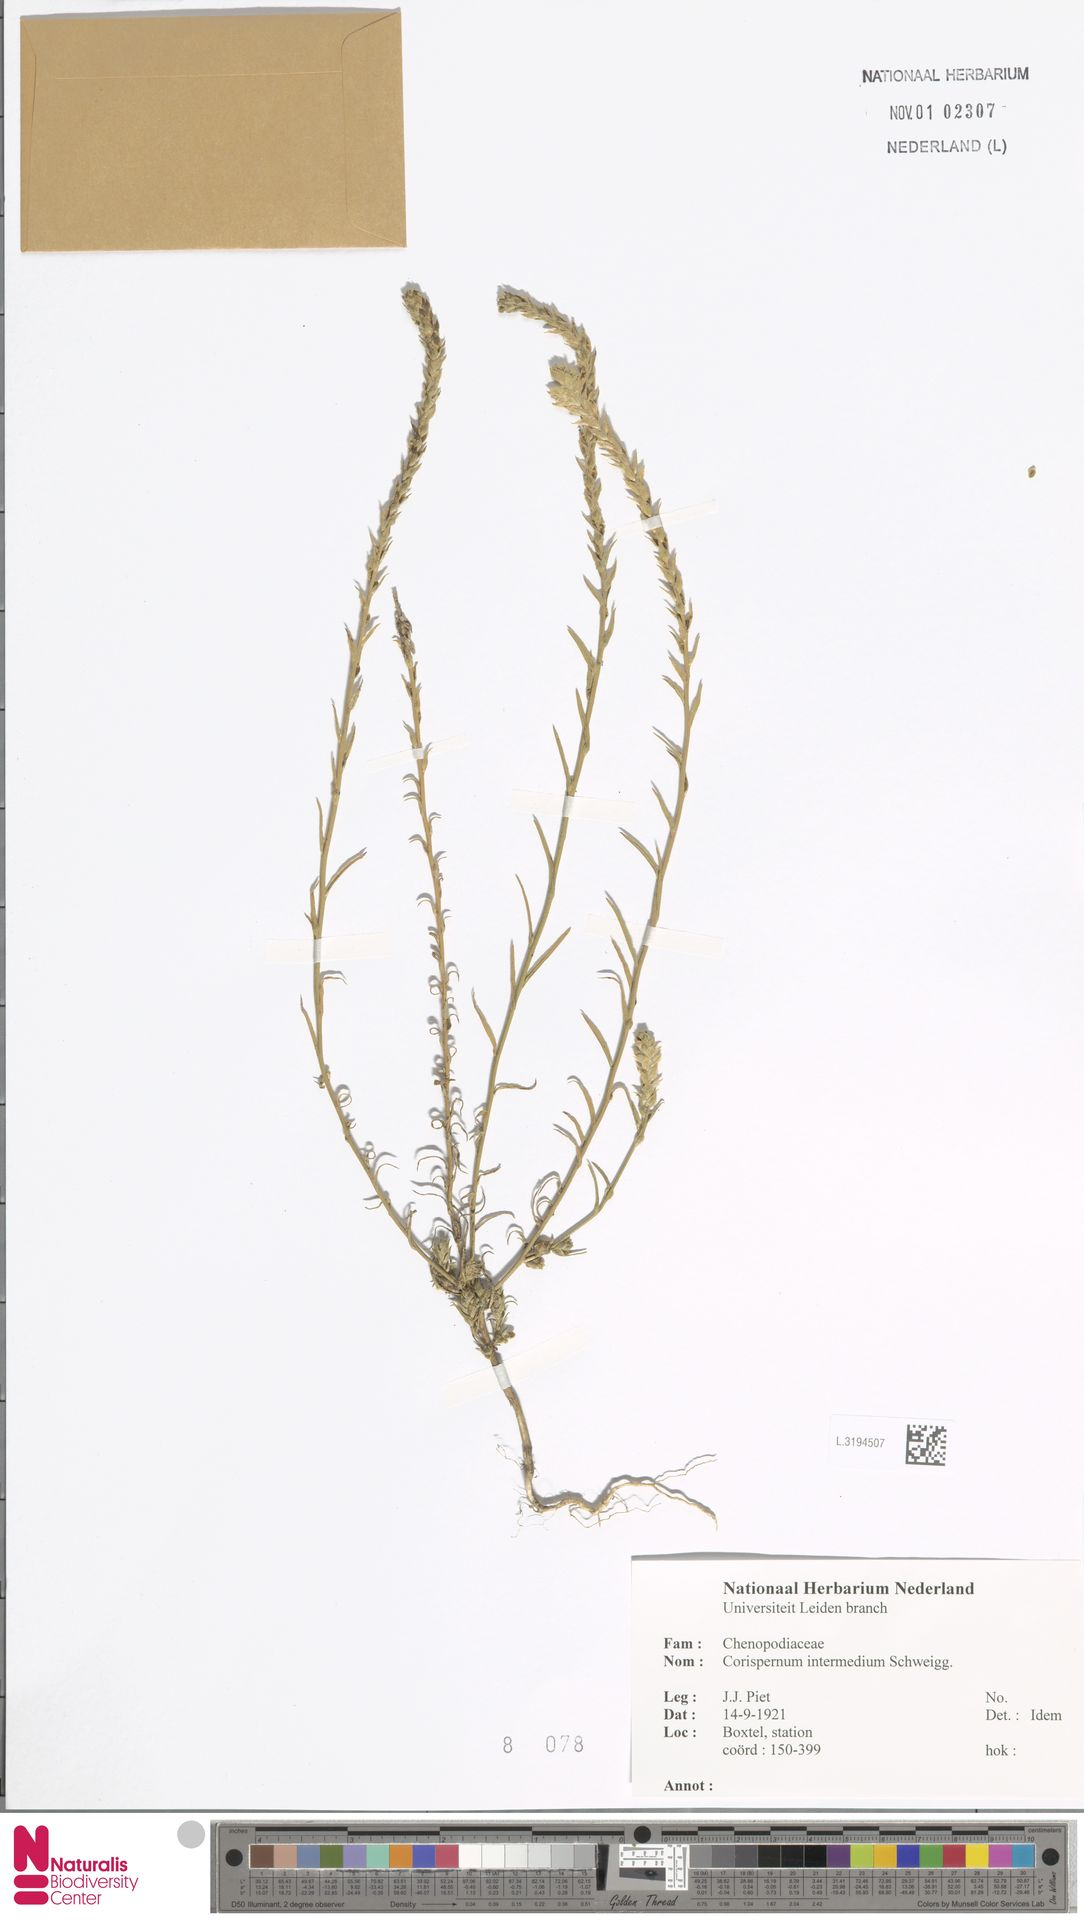 L.3194507 | Corispermum intermedium Schweigg.